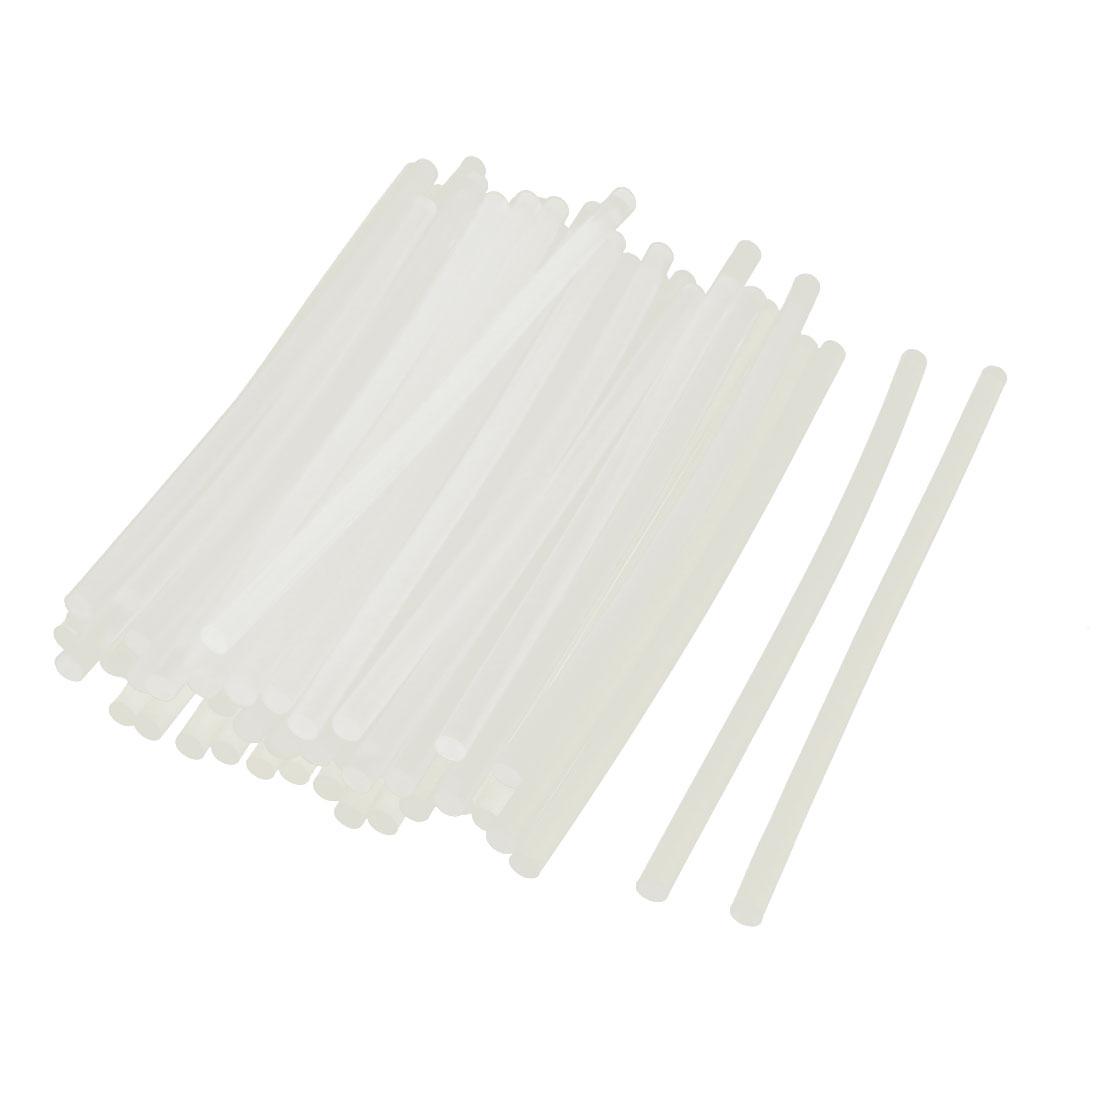 50pcs Clear Hobby Craft Adhesive Hot Melt Glue Gun Sticks 7mm x 190mm